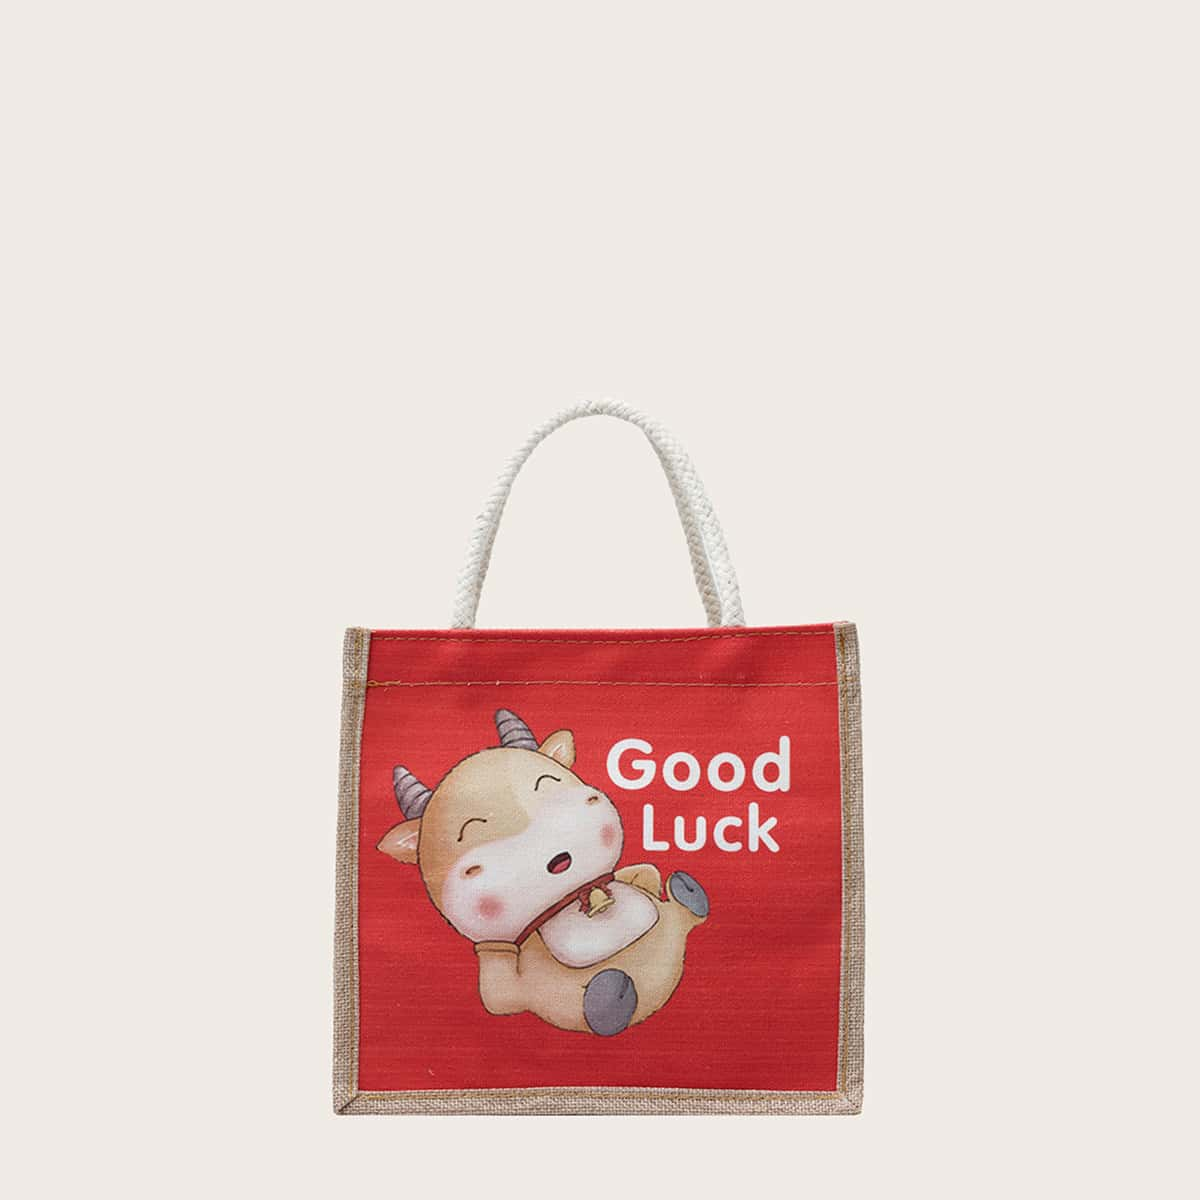 SHEIN / Cartoon & Letter Graphic Satchel Bag